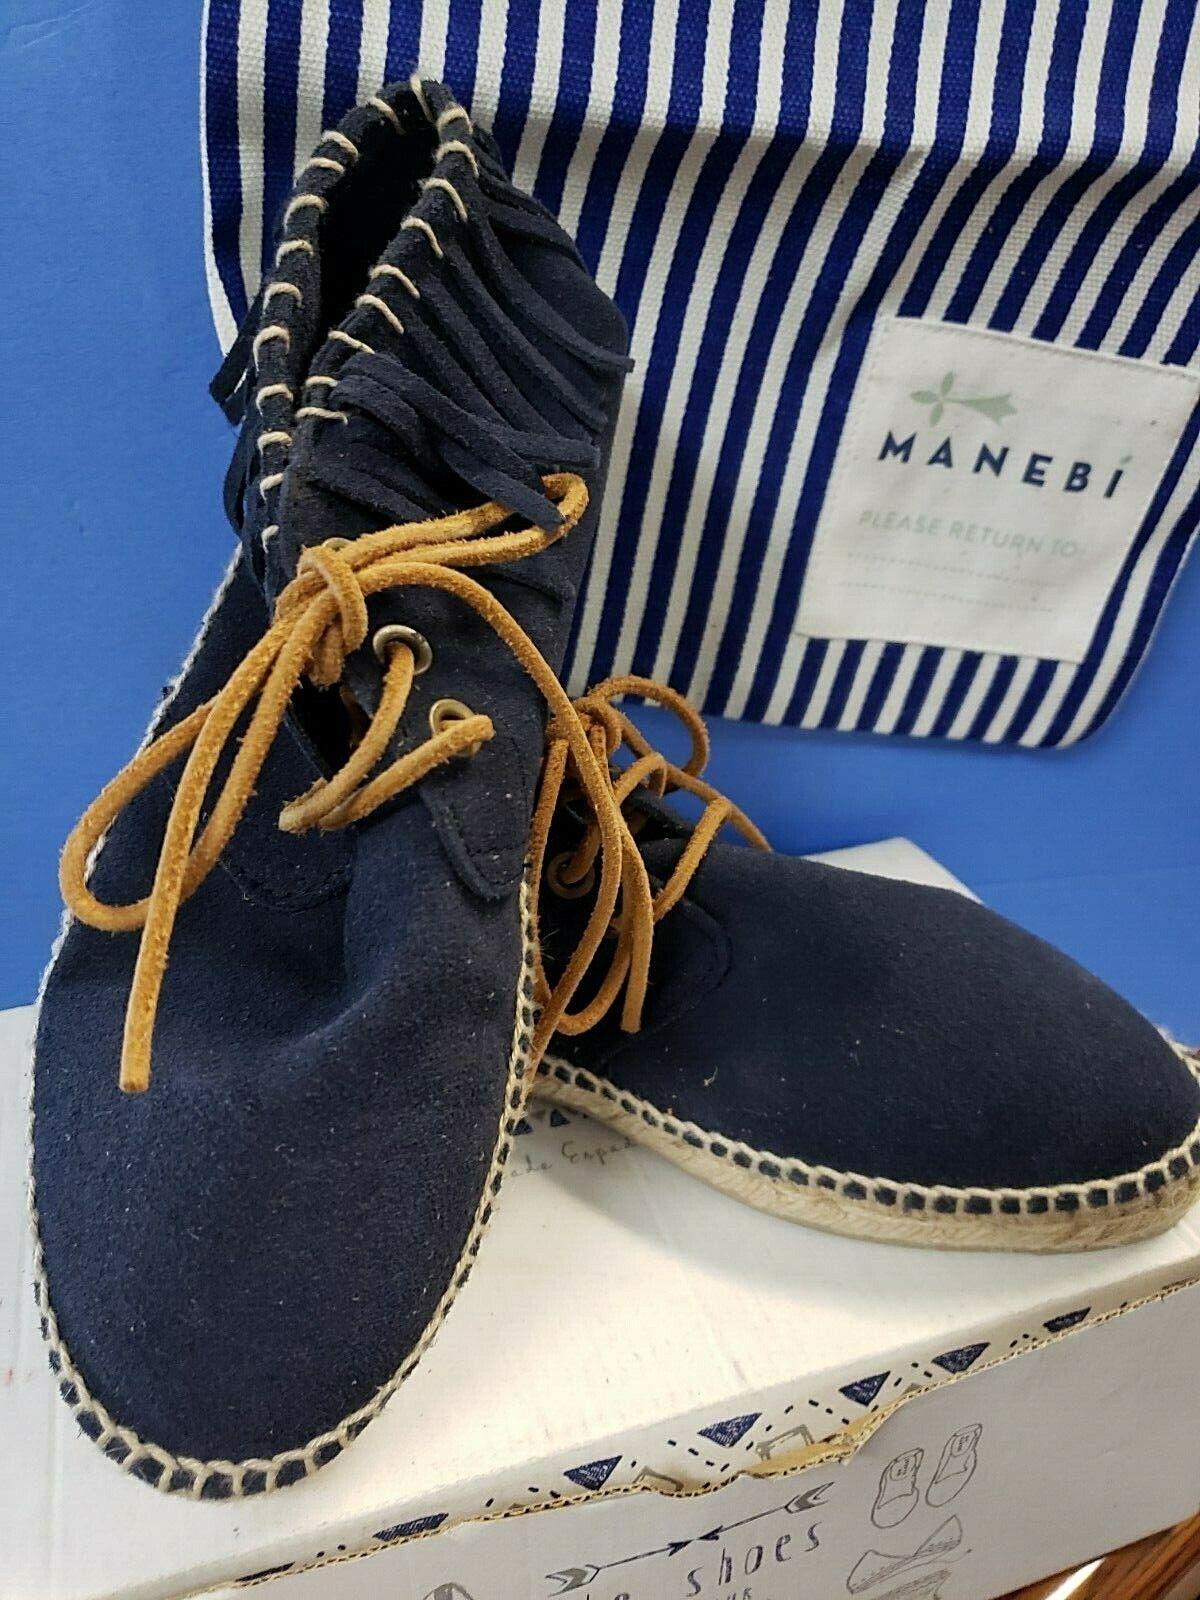 Manebi Lace up Fringe Patriot bluee  CHEROKEE No.37   size  7 K15A01